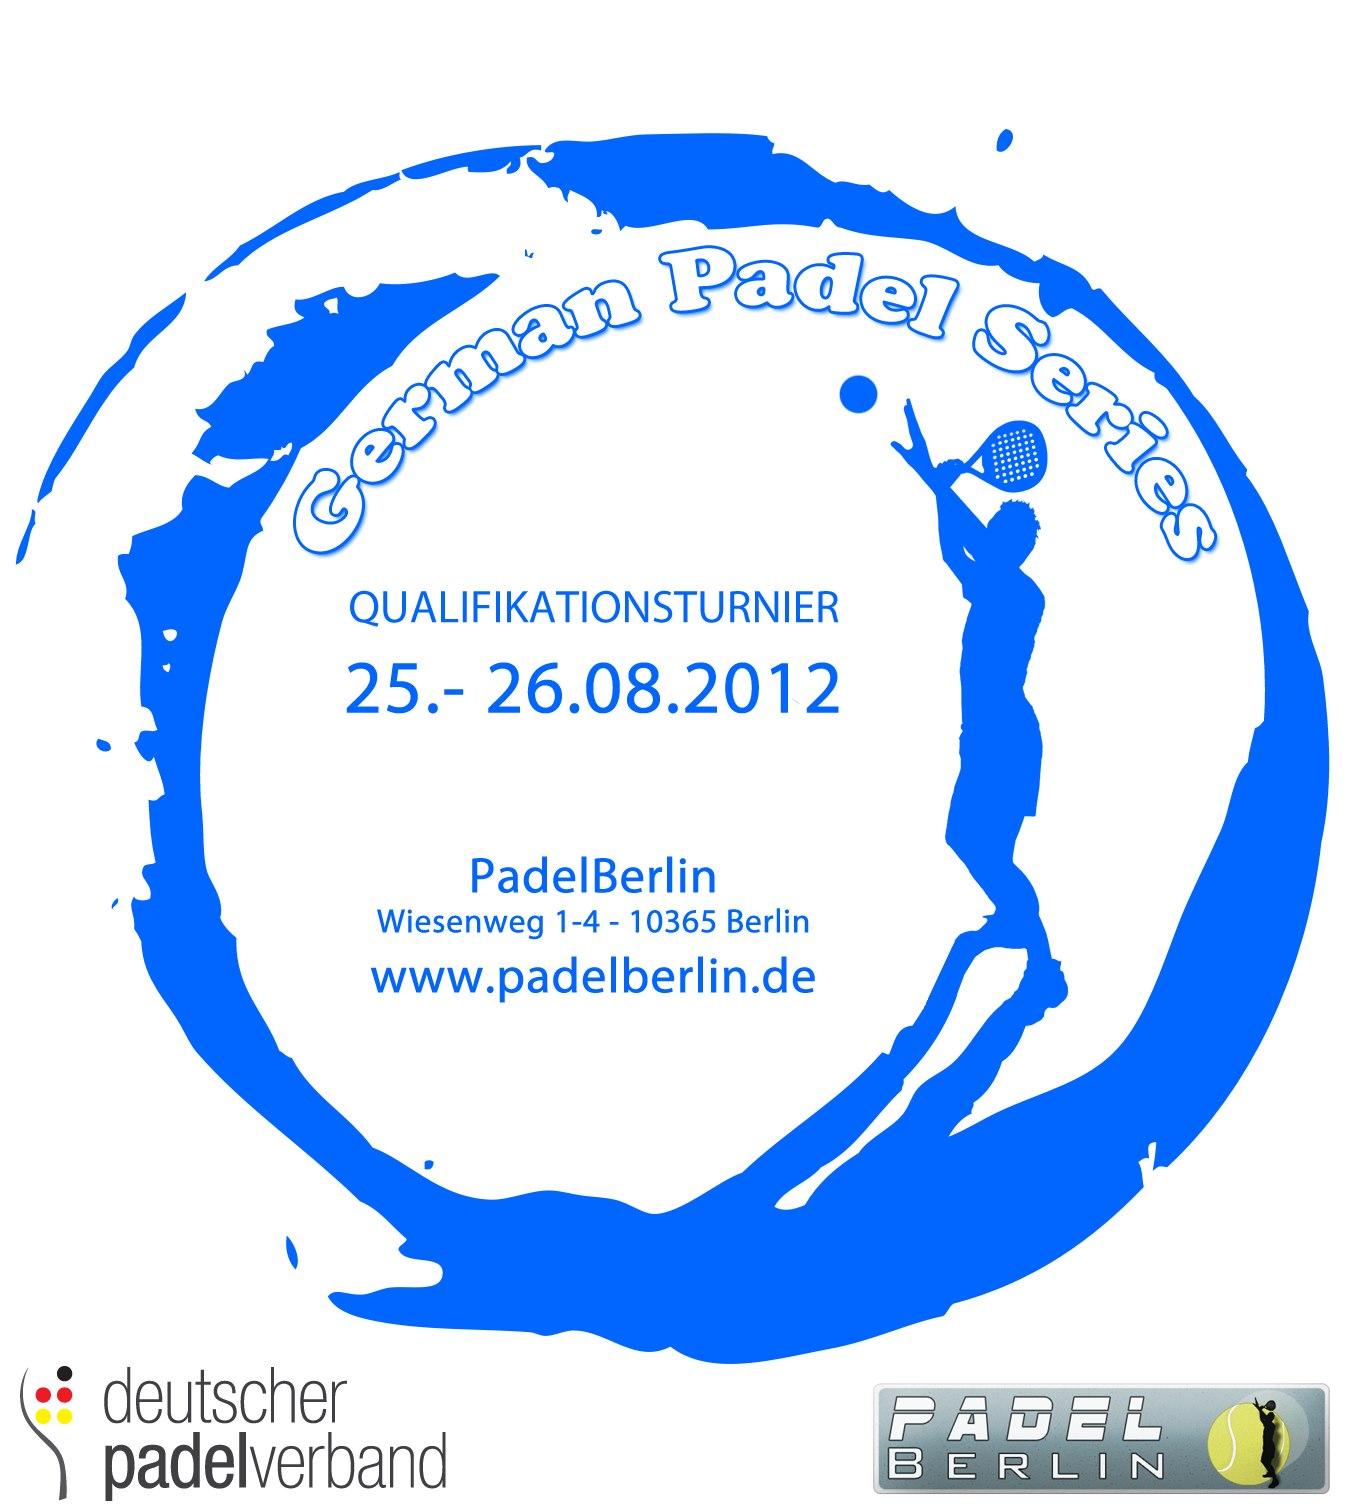 Padel Berlin - Deutscher Padel Verband e.V.